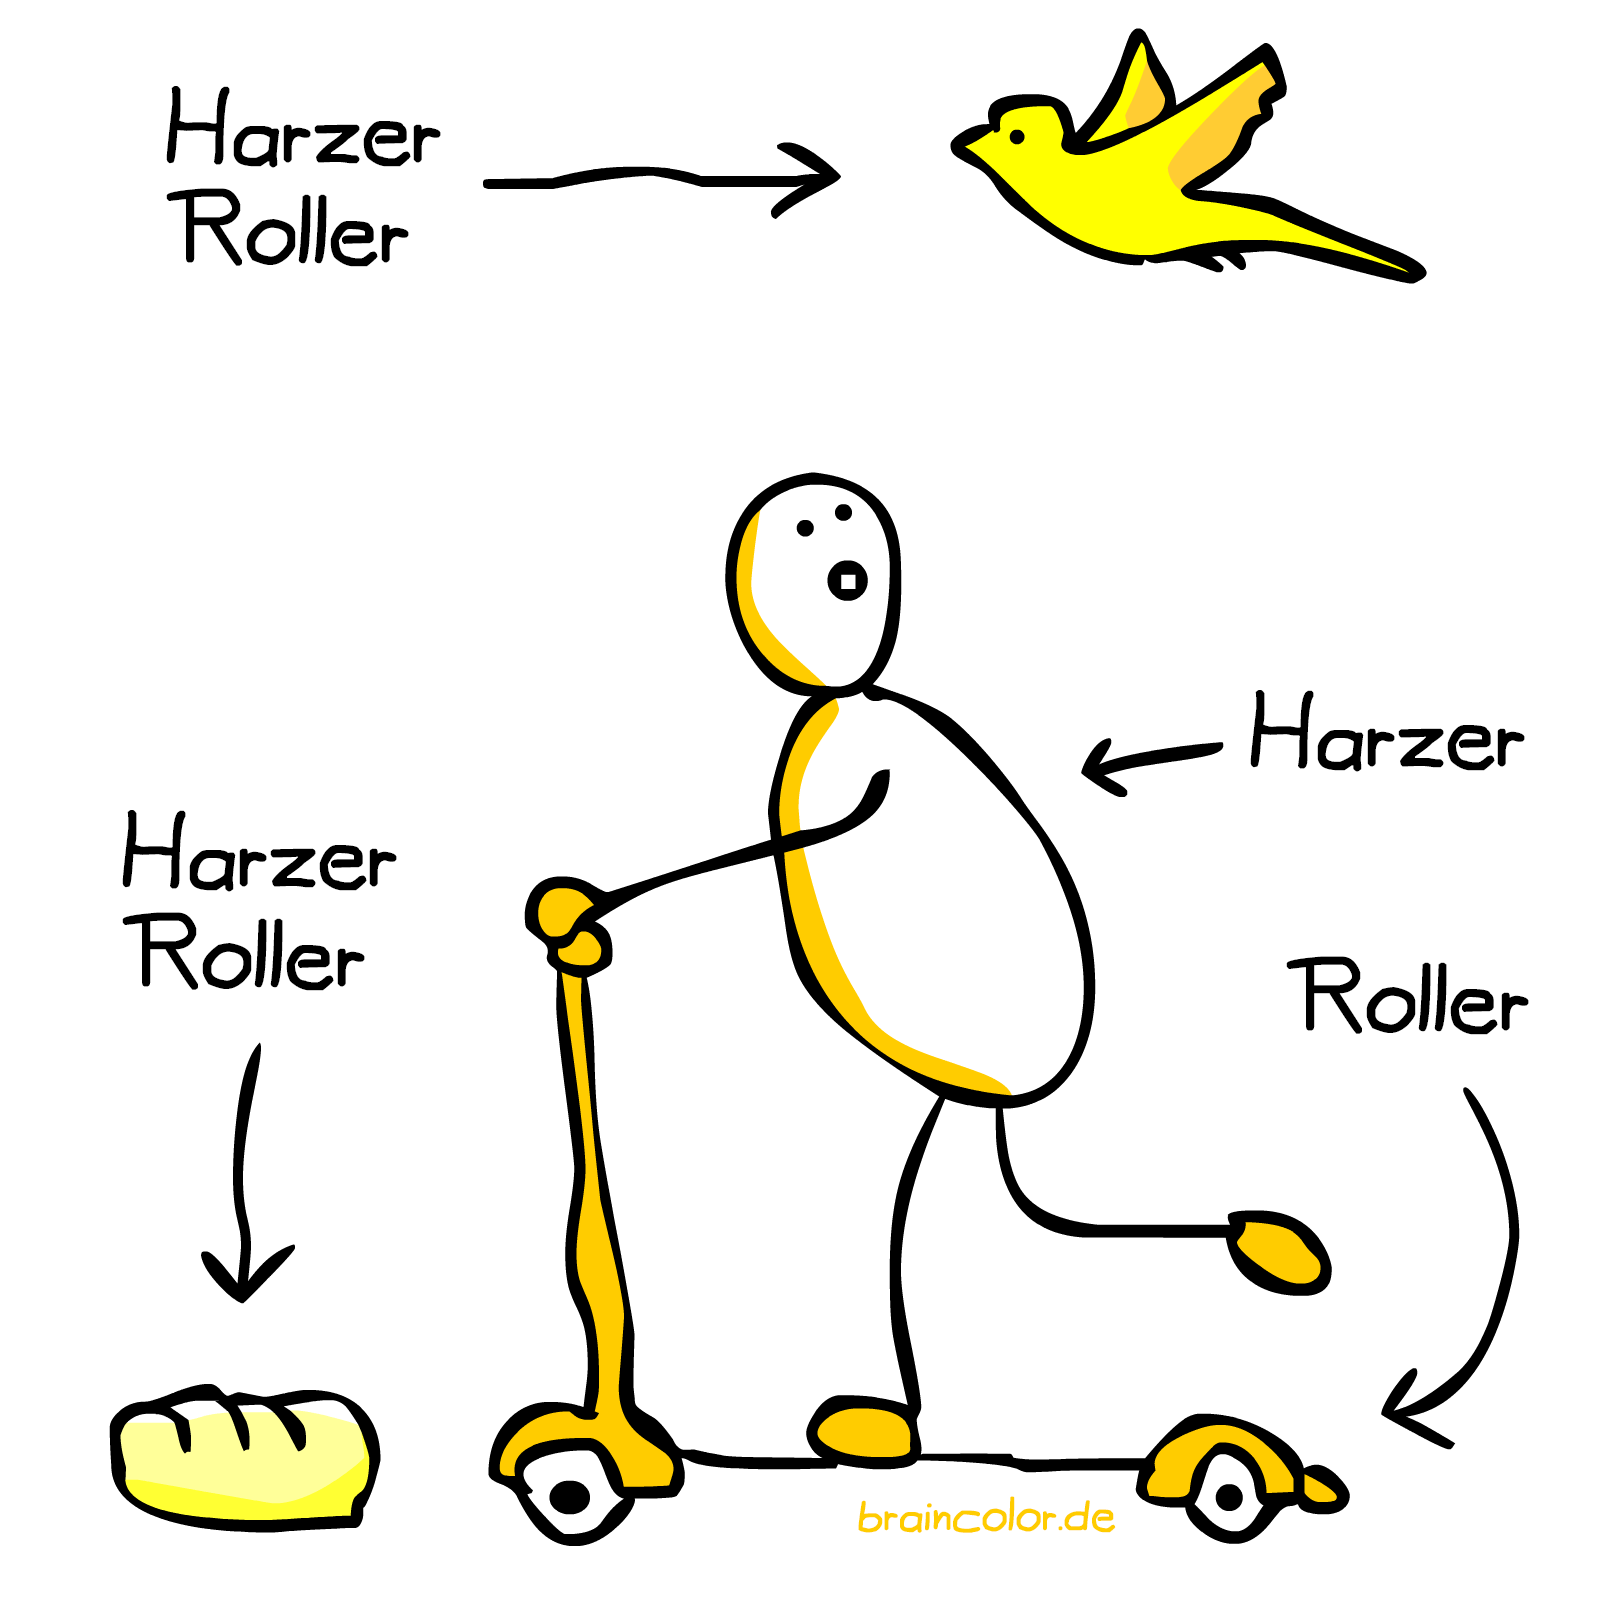 Harzer Roller